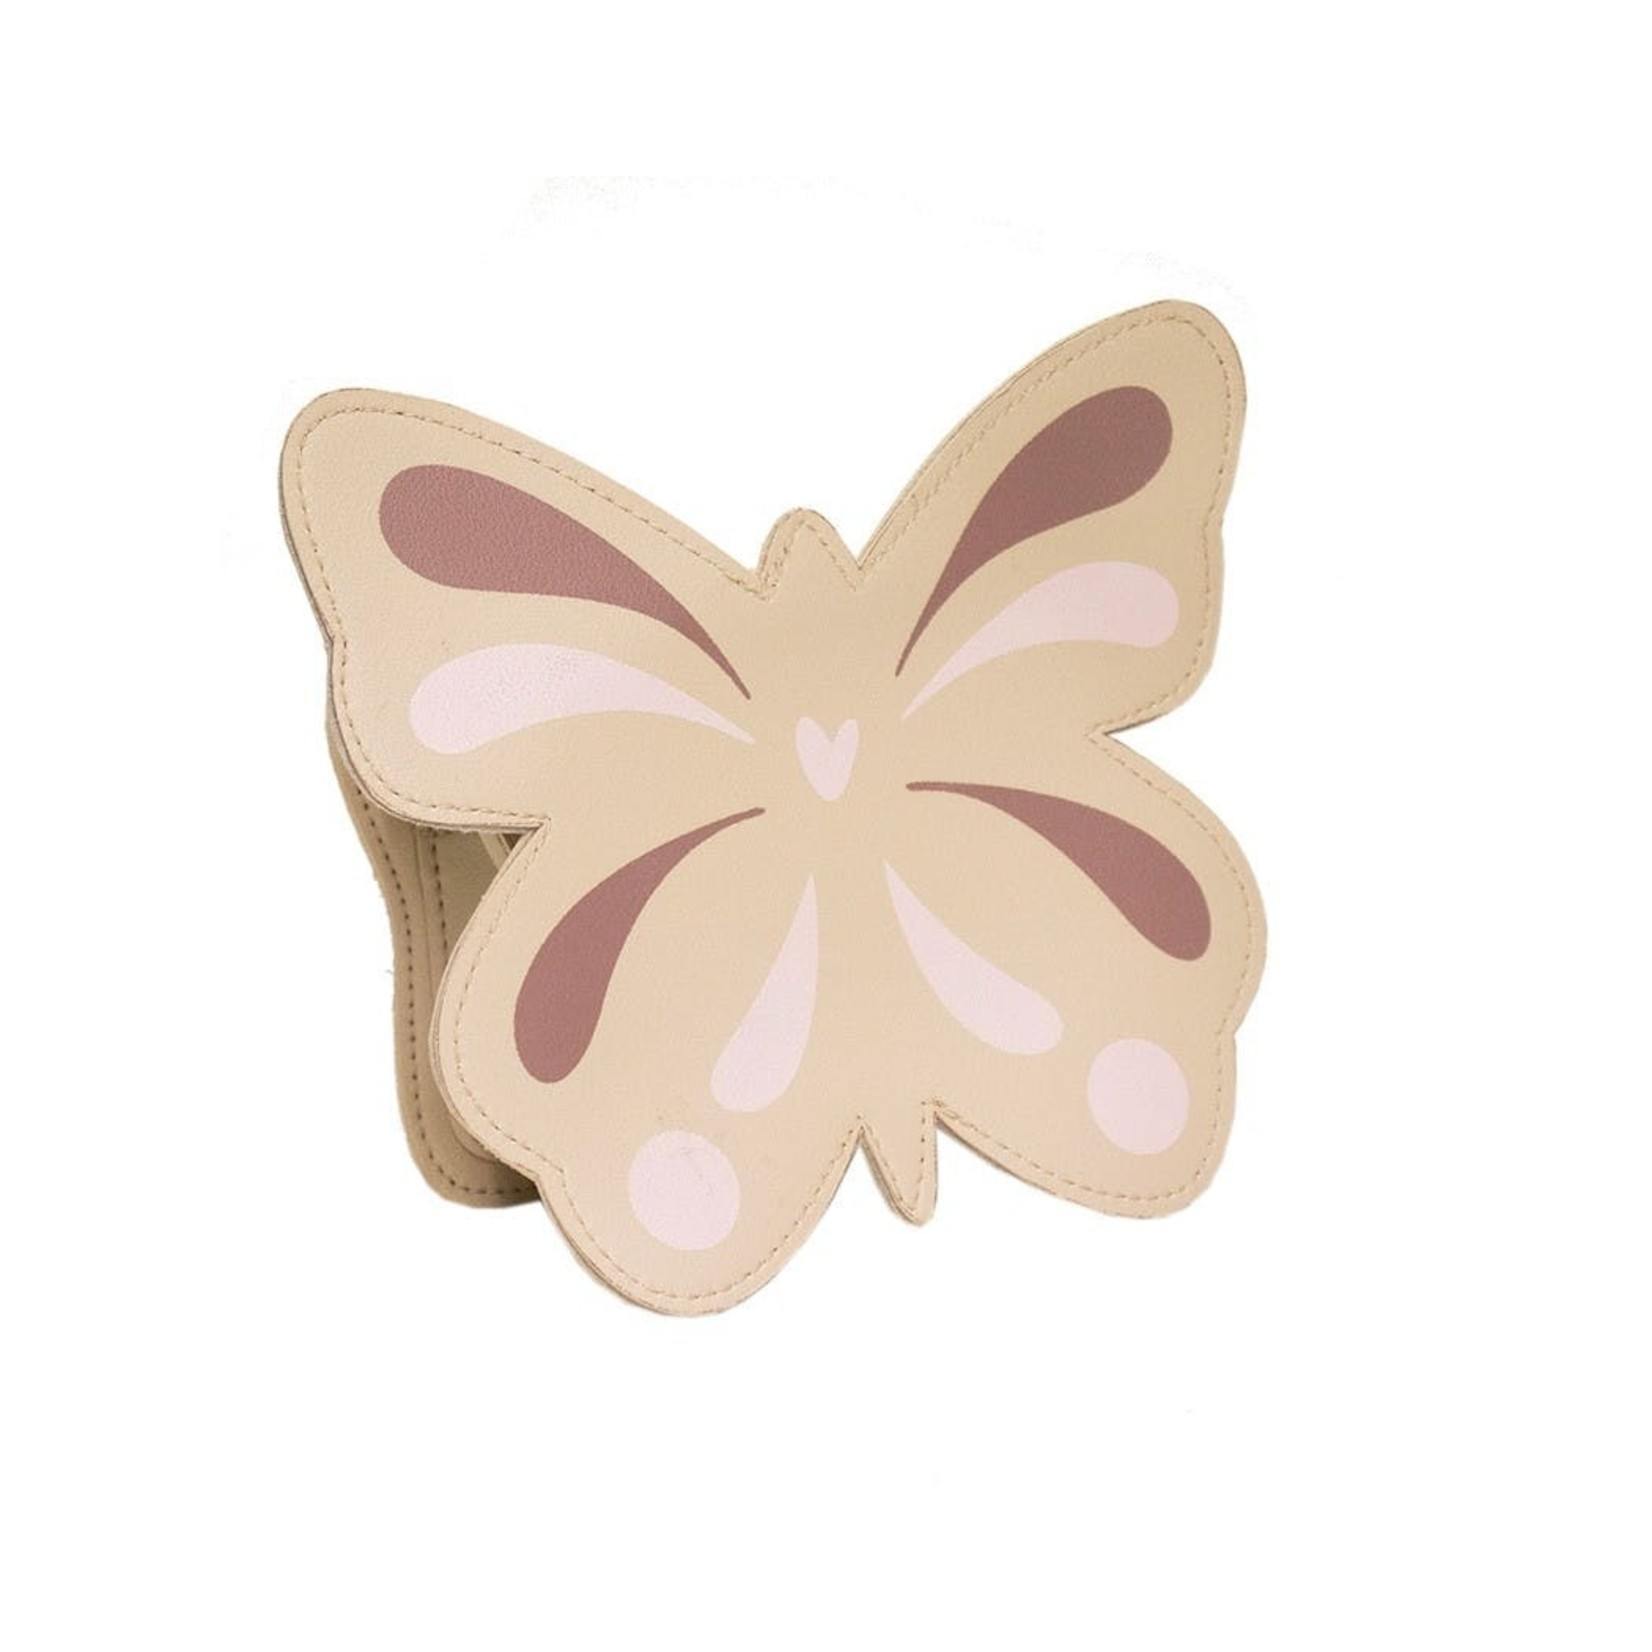 Yuko B Vlinderhandtasje